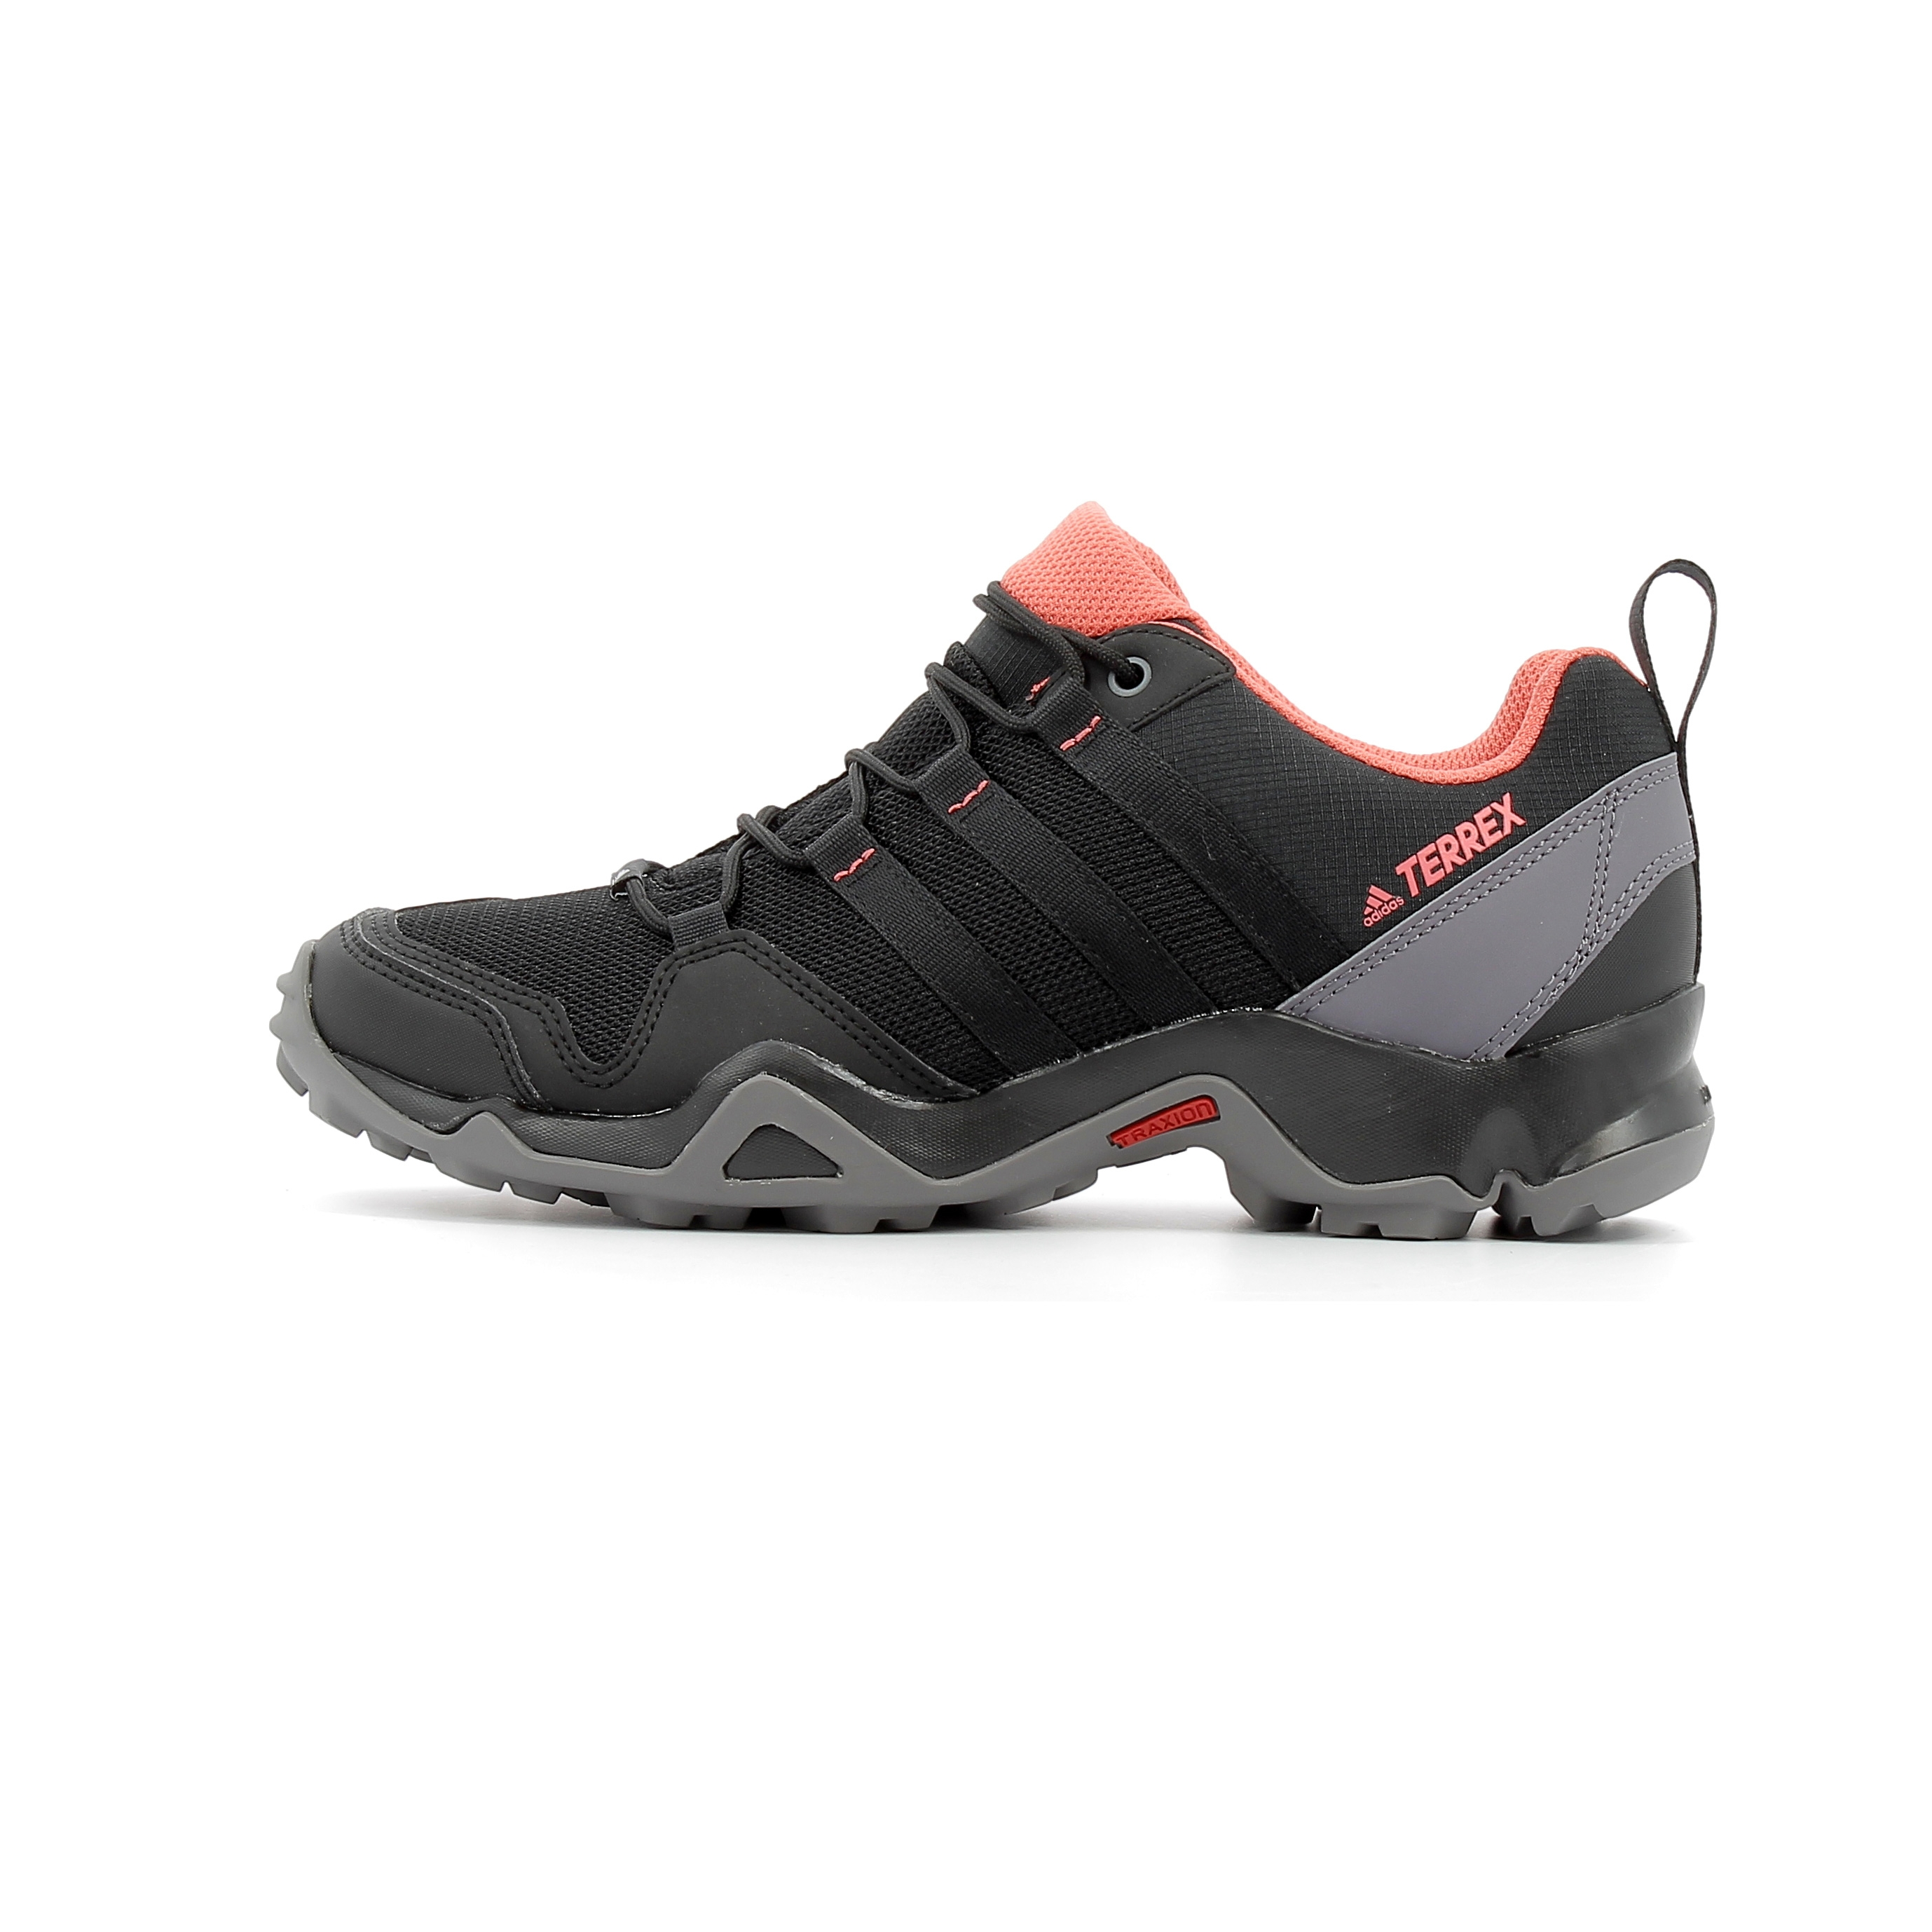 Randonnée Adidas De Femme Terrex Performance Ax2r Chaussure v5qxZ6wS